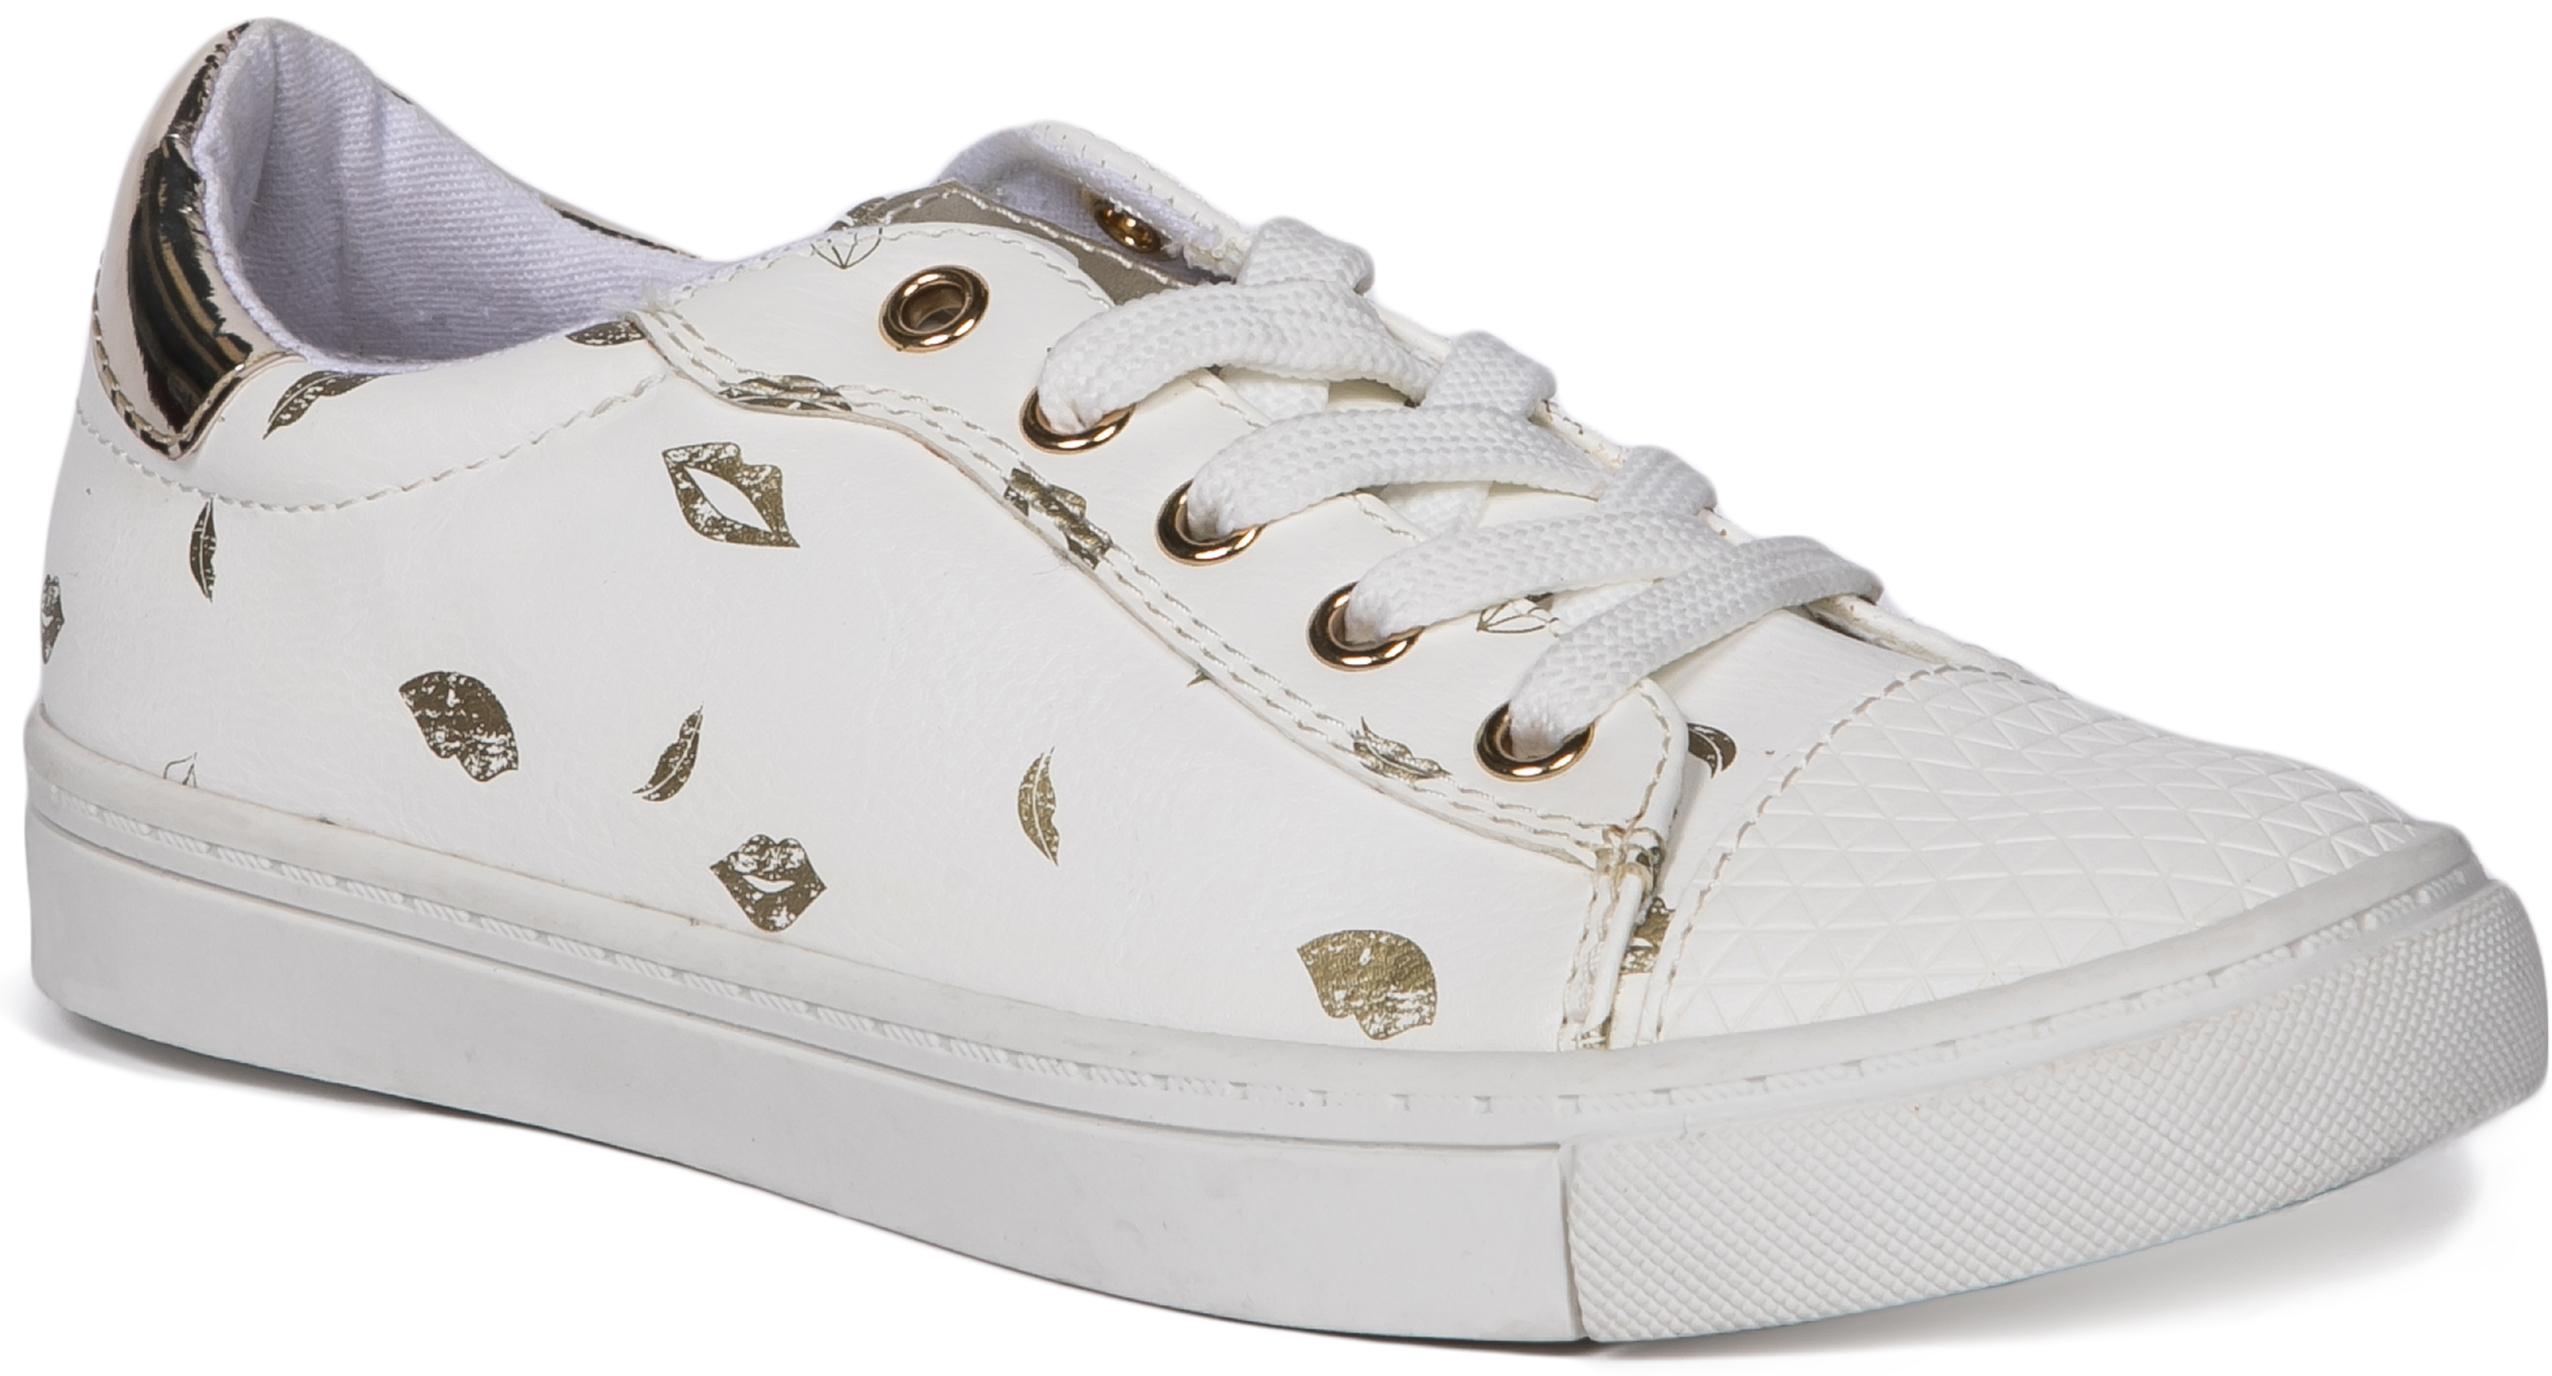 Ботинки и полуботинки Barkito Полуботинки типа кроссовых для девочки Barkito, белый полуботинки типа кроссовых для девочки barkito розовый